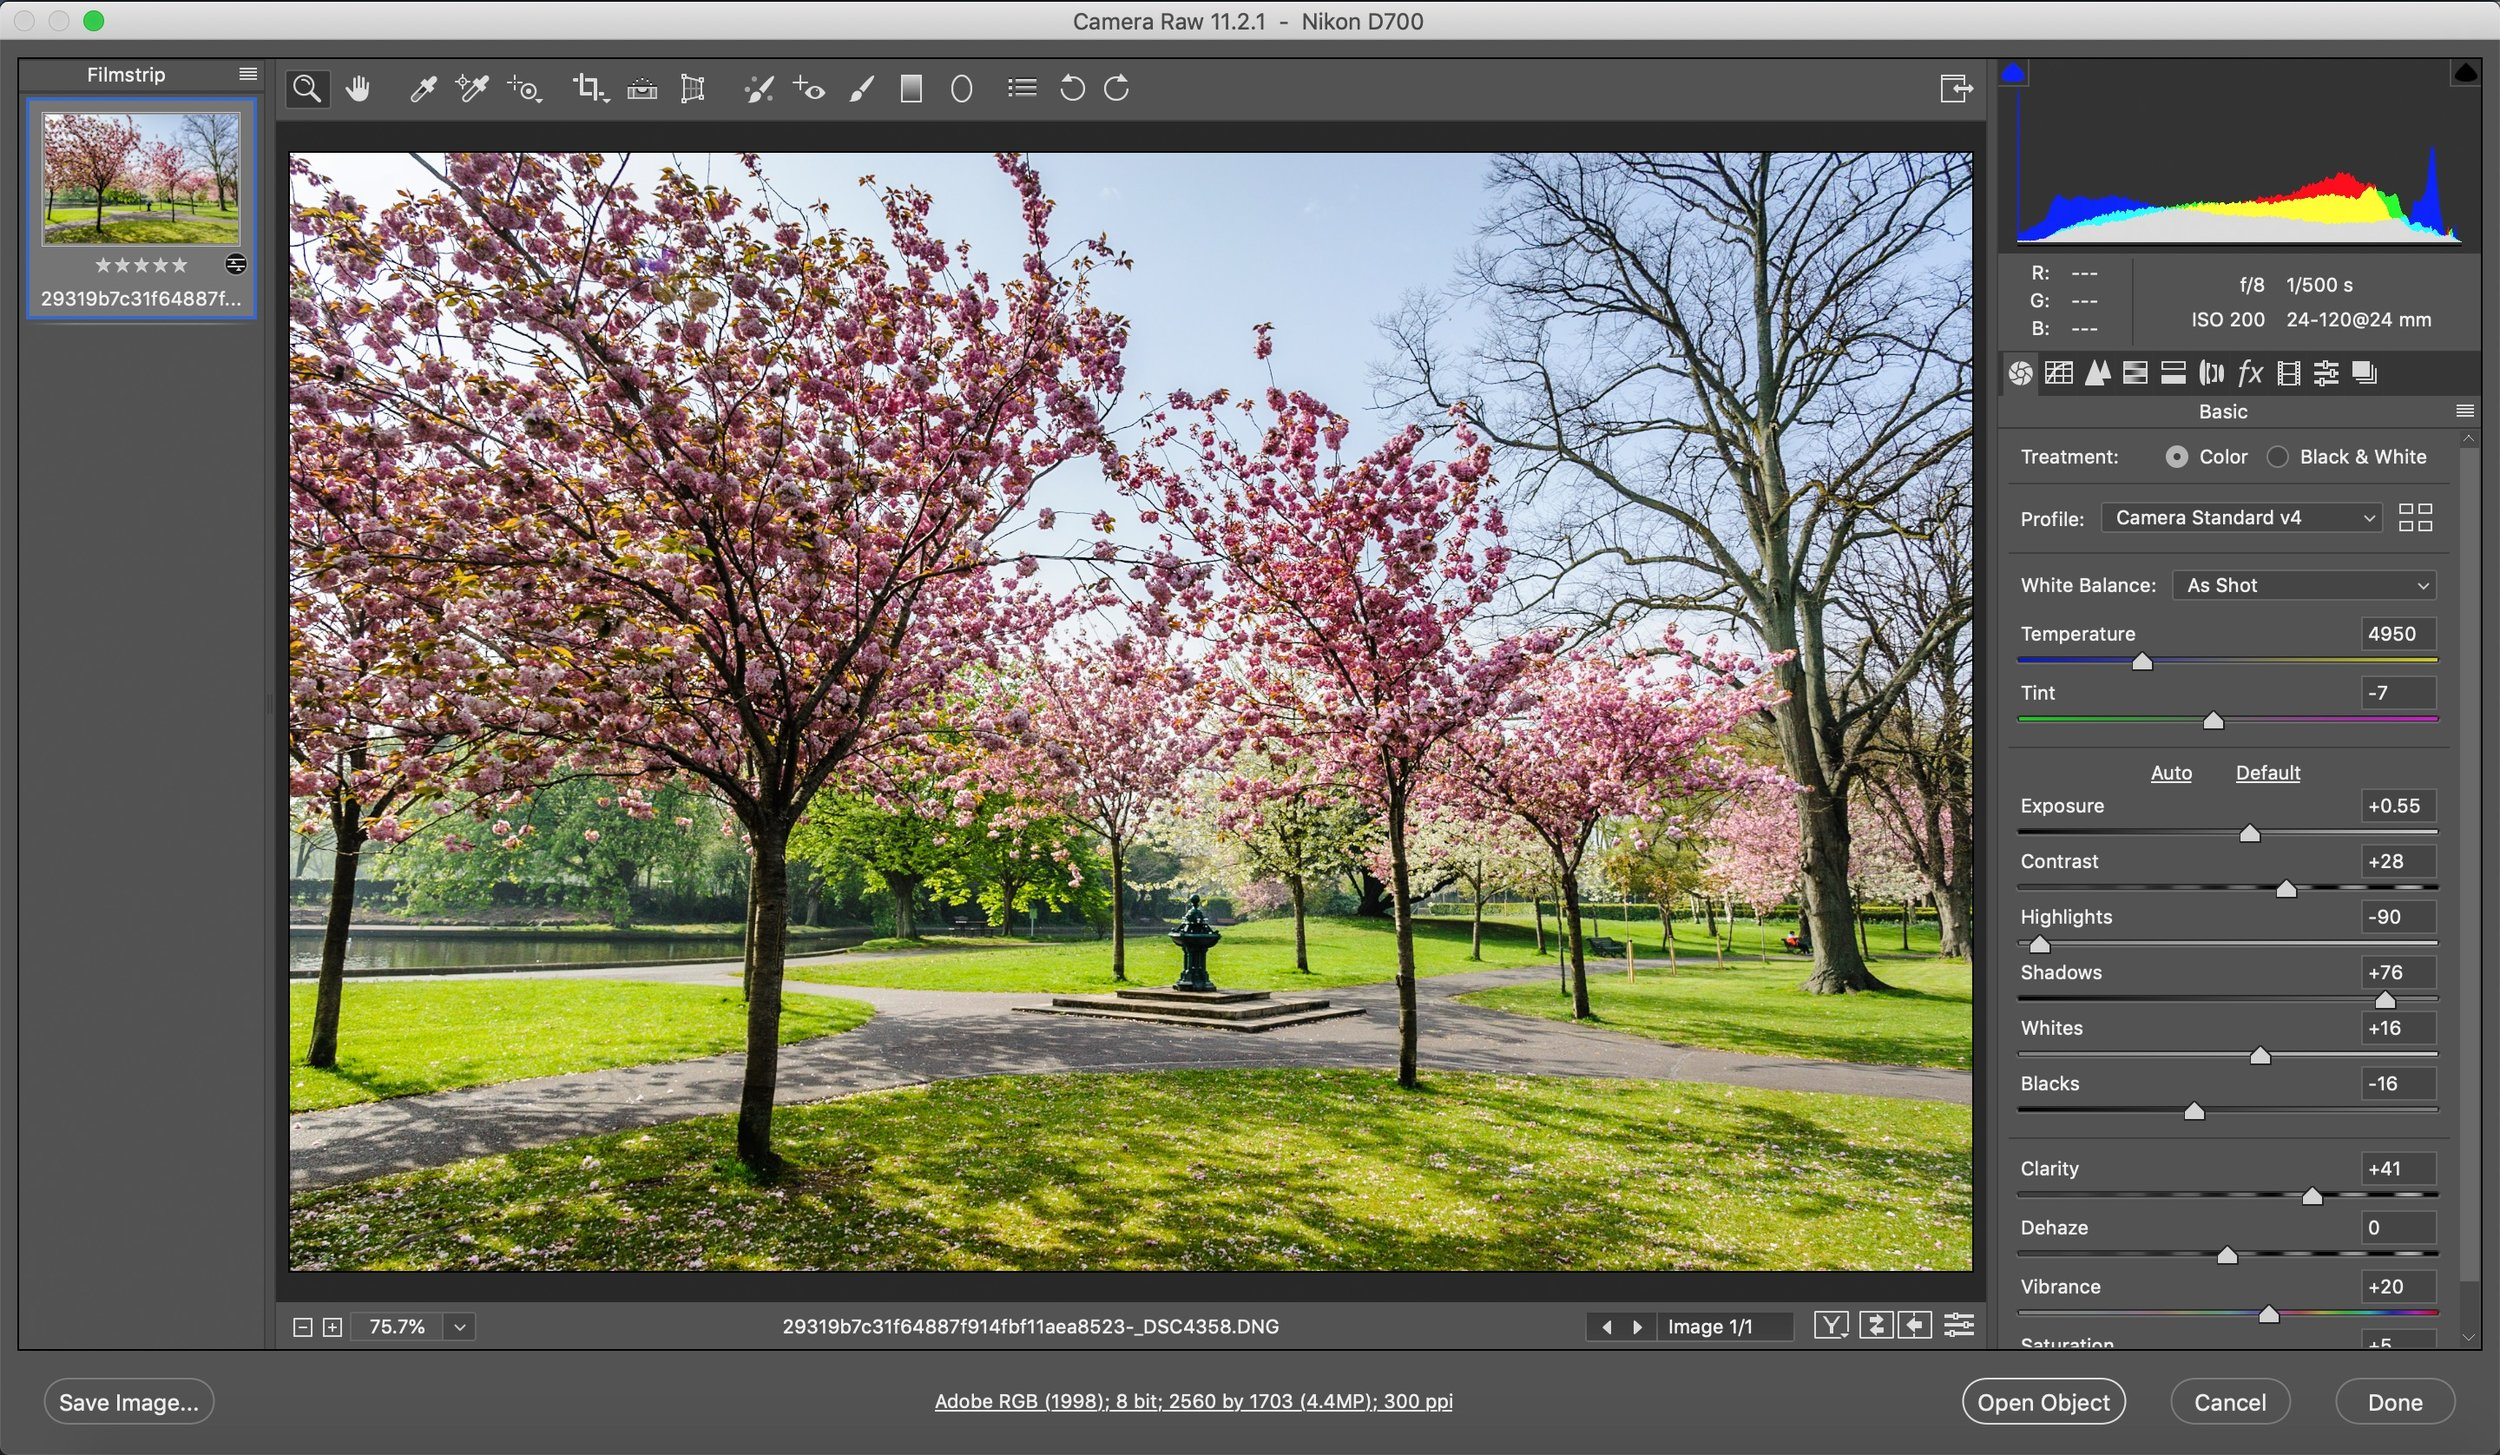 Lightroom May 2019 Updates (Lightroom Classic 8 3 Released) — Thomas